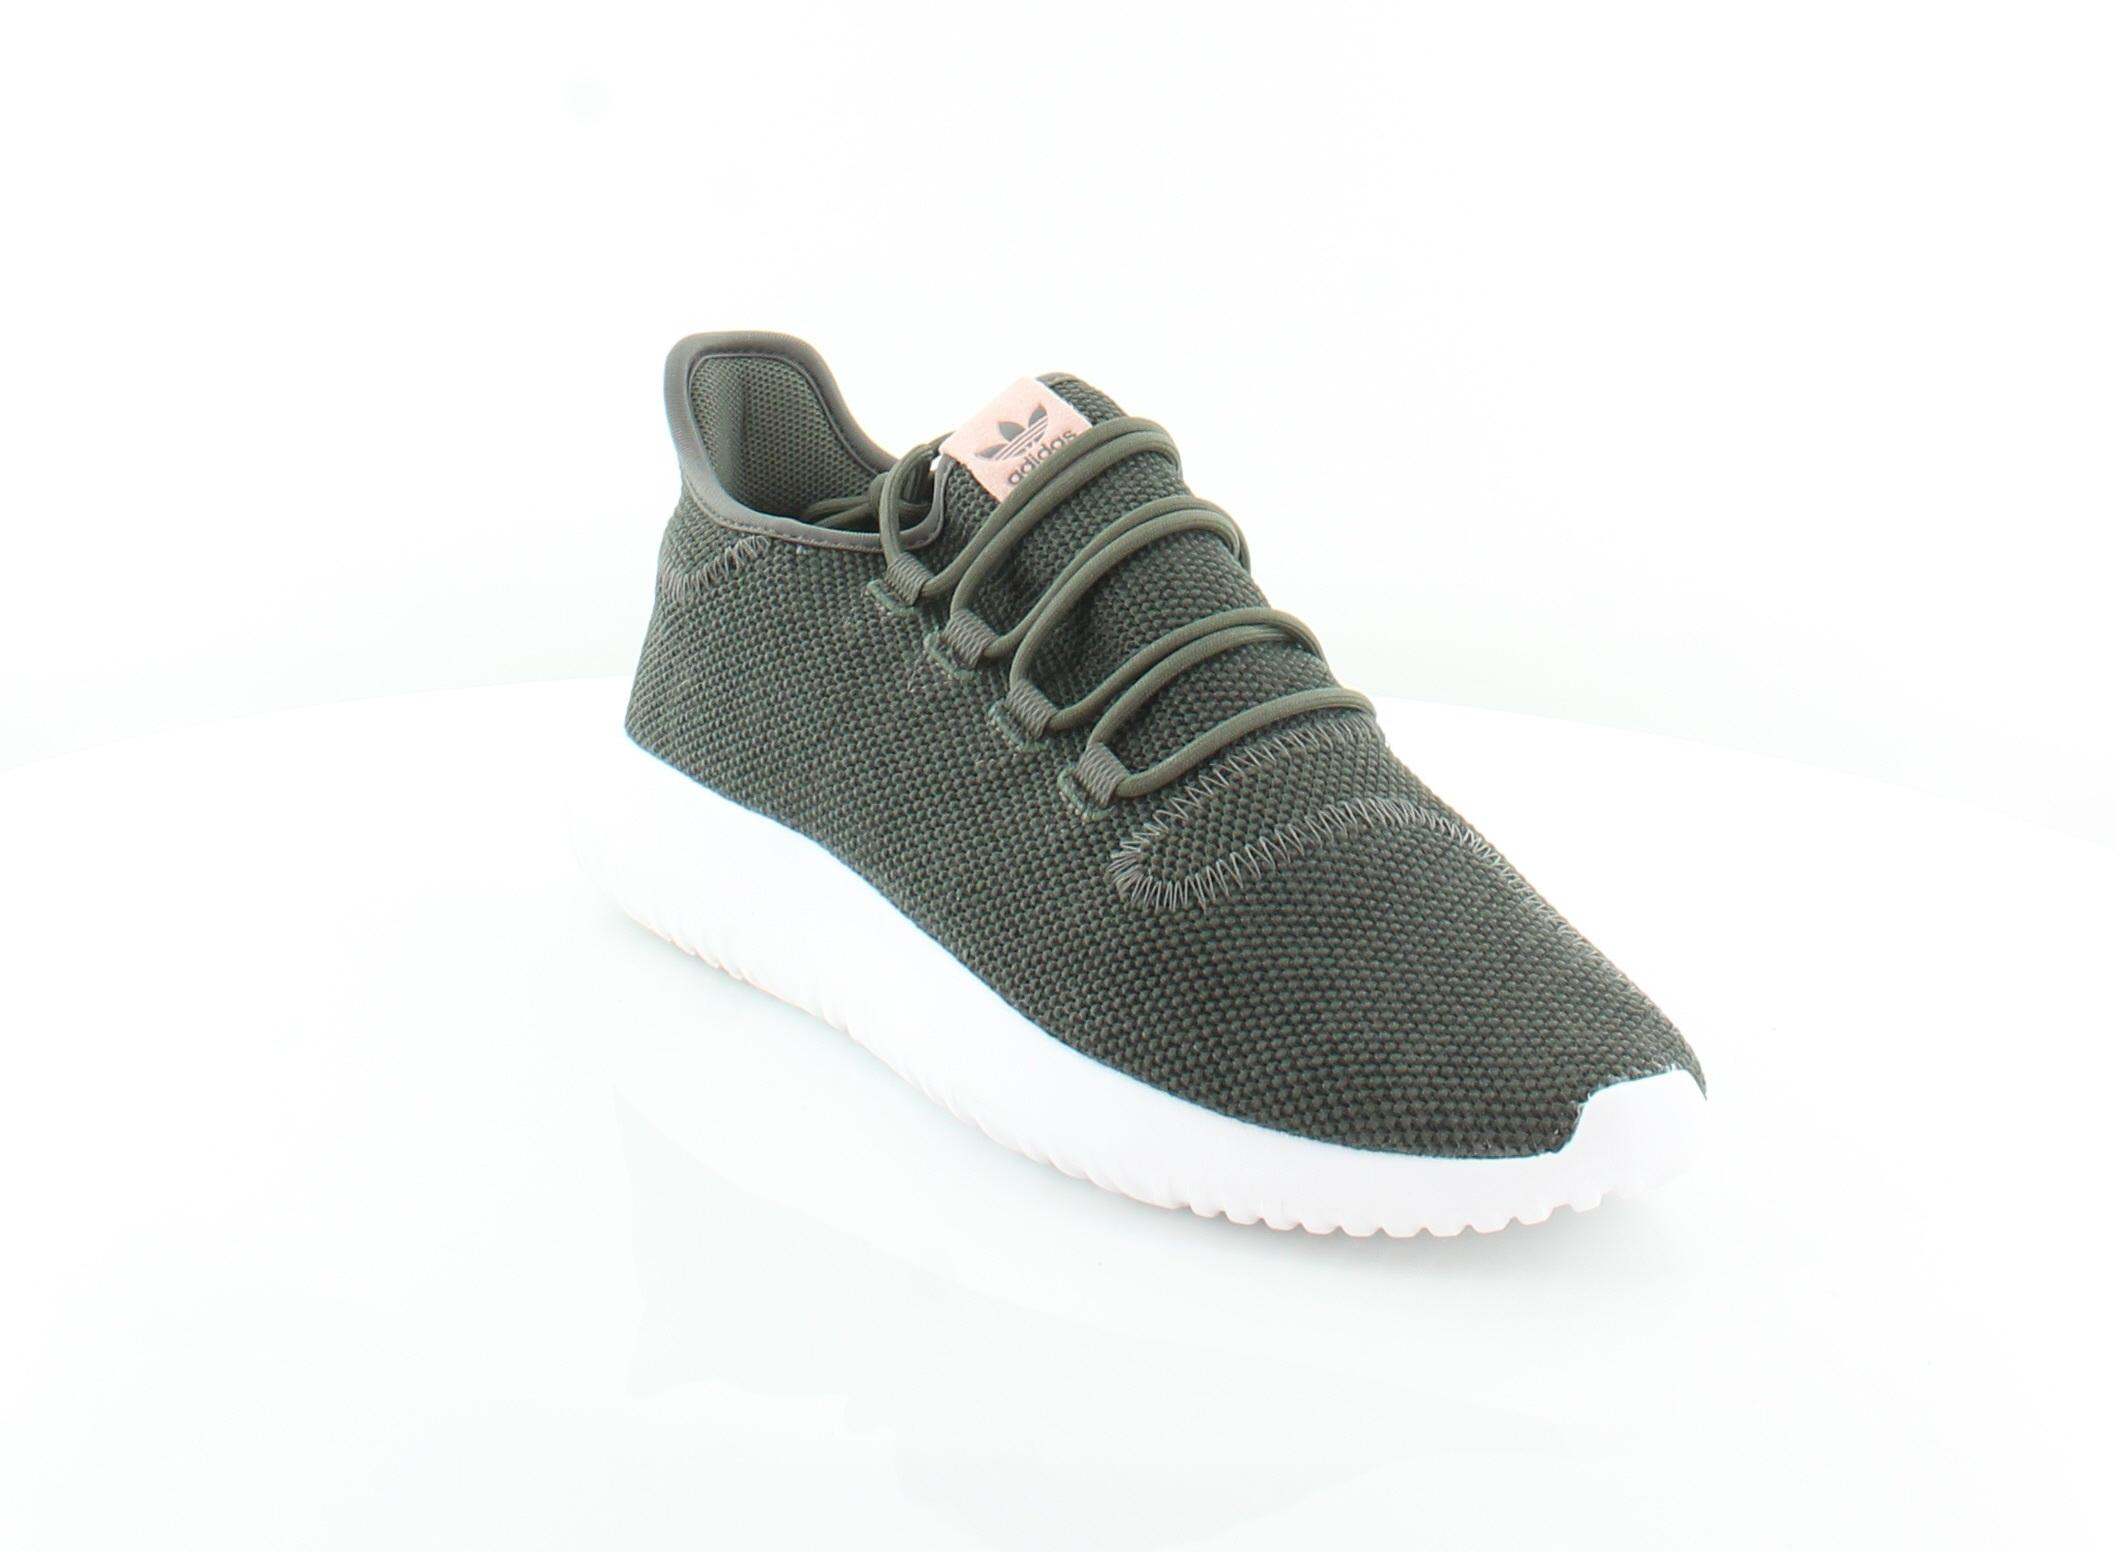 de moda de Tama para Shadow 100 Zapatos mujer Green Zapatillas Msrp o 11 Tubular Adidas deporte M PxqBwR6O